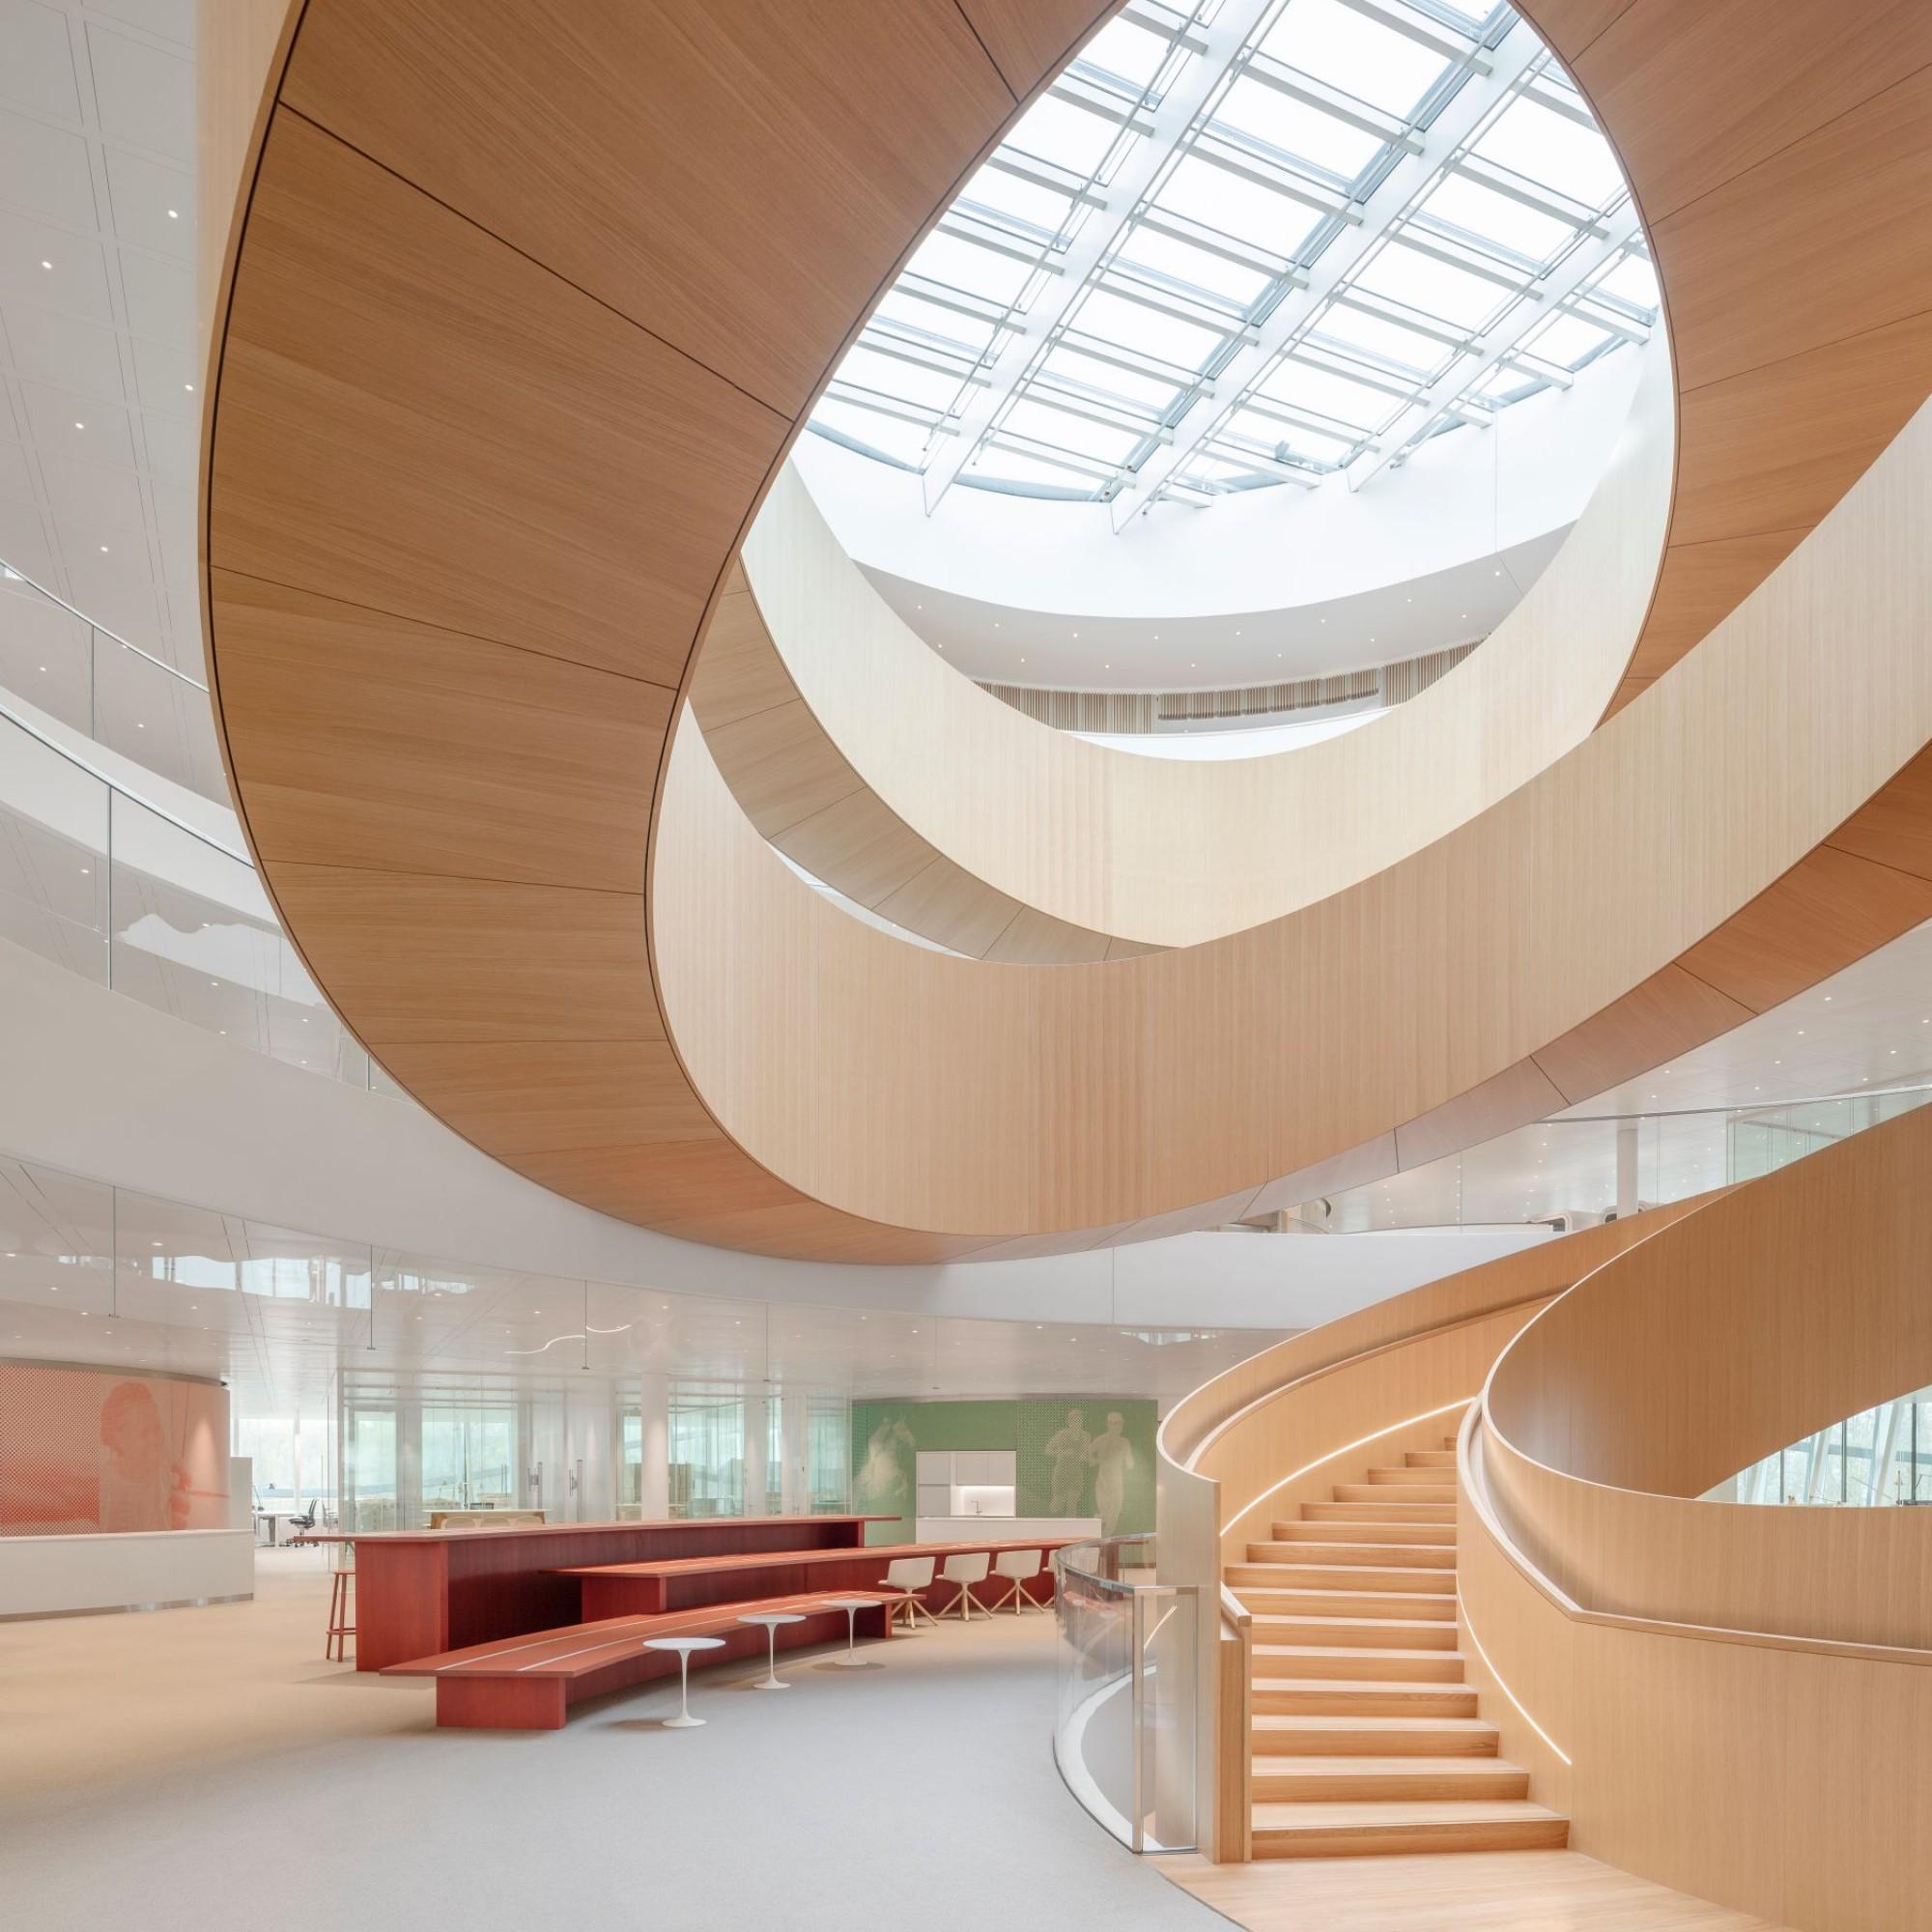 CIO: escalier central de la Maison olympique.